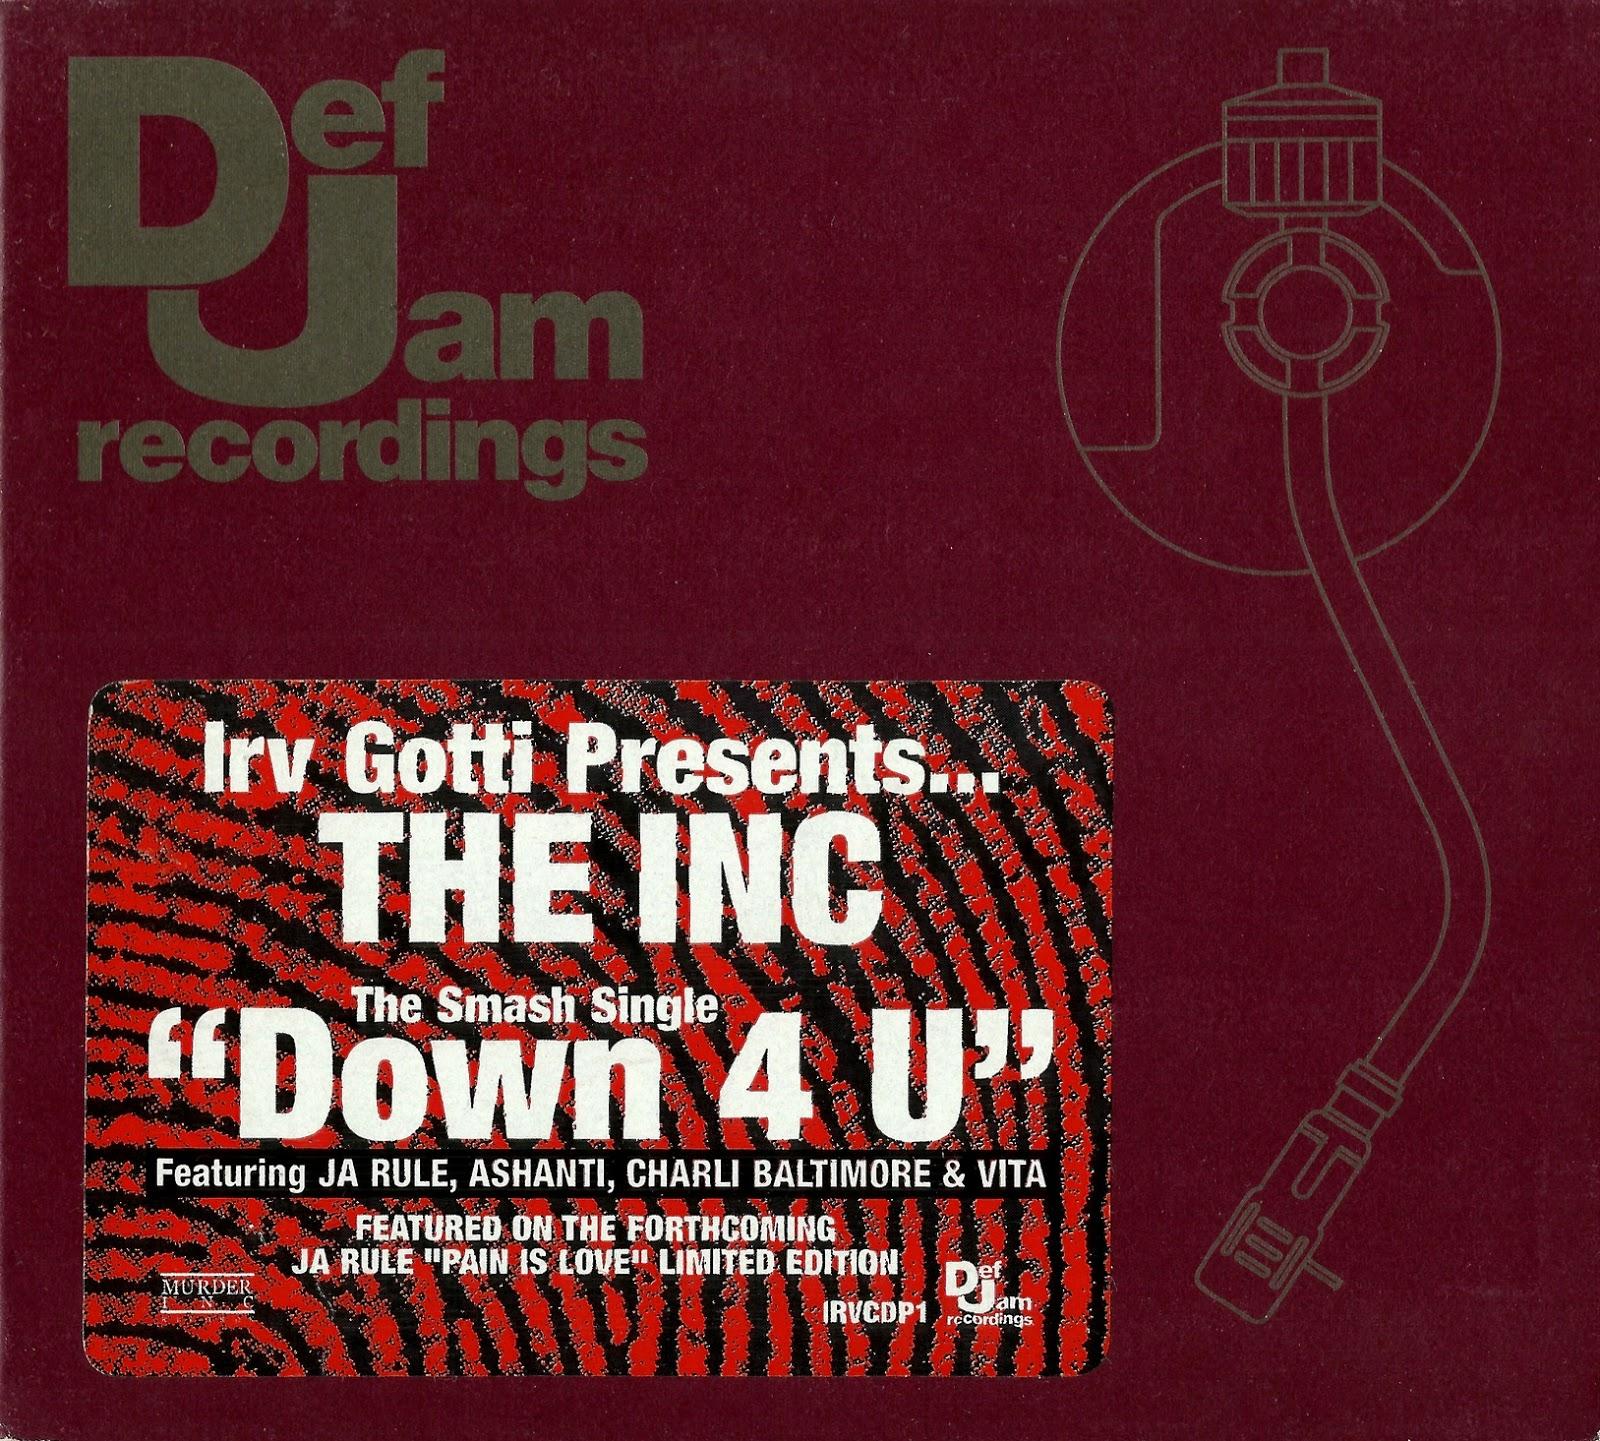 Ja rule riddims by fs green | free listening on soundcloud.